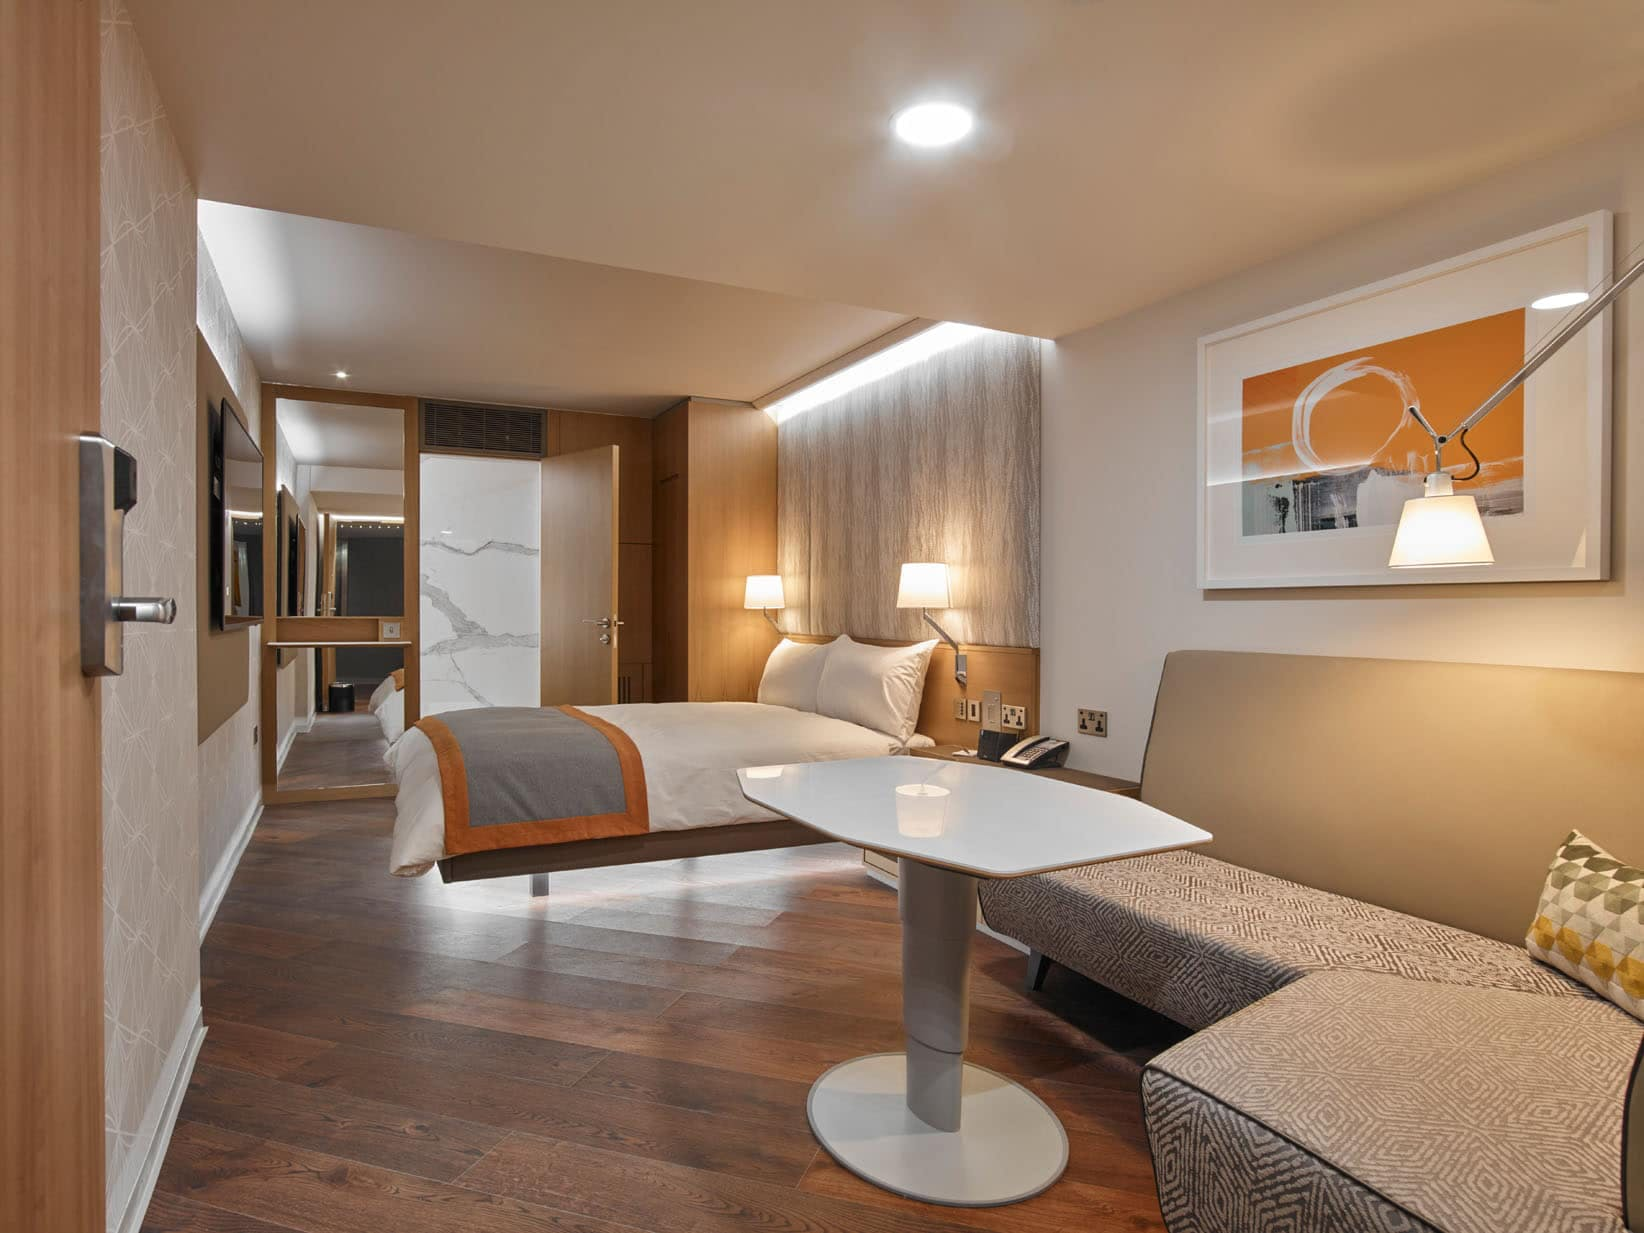 Club Level Classic Room at Club Quarters Hotel, Lincoln's Inn Fields, London